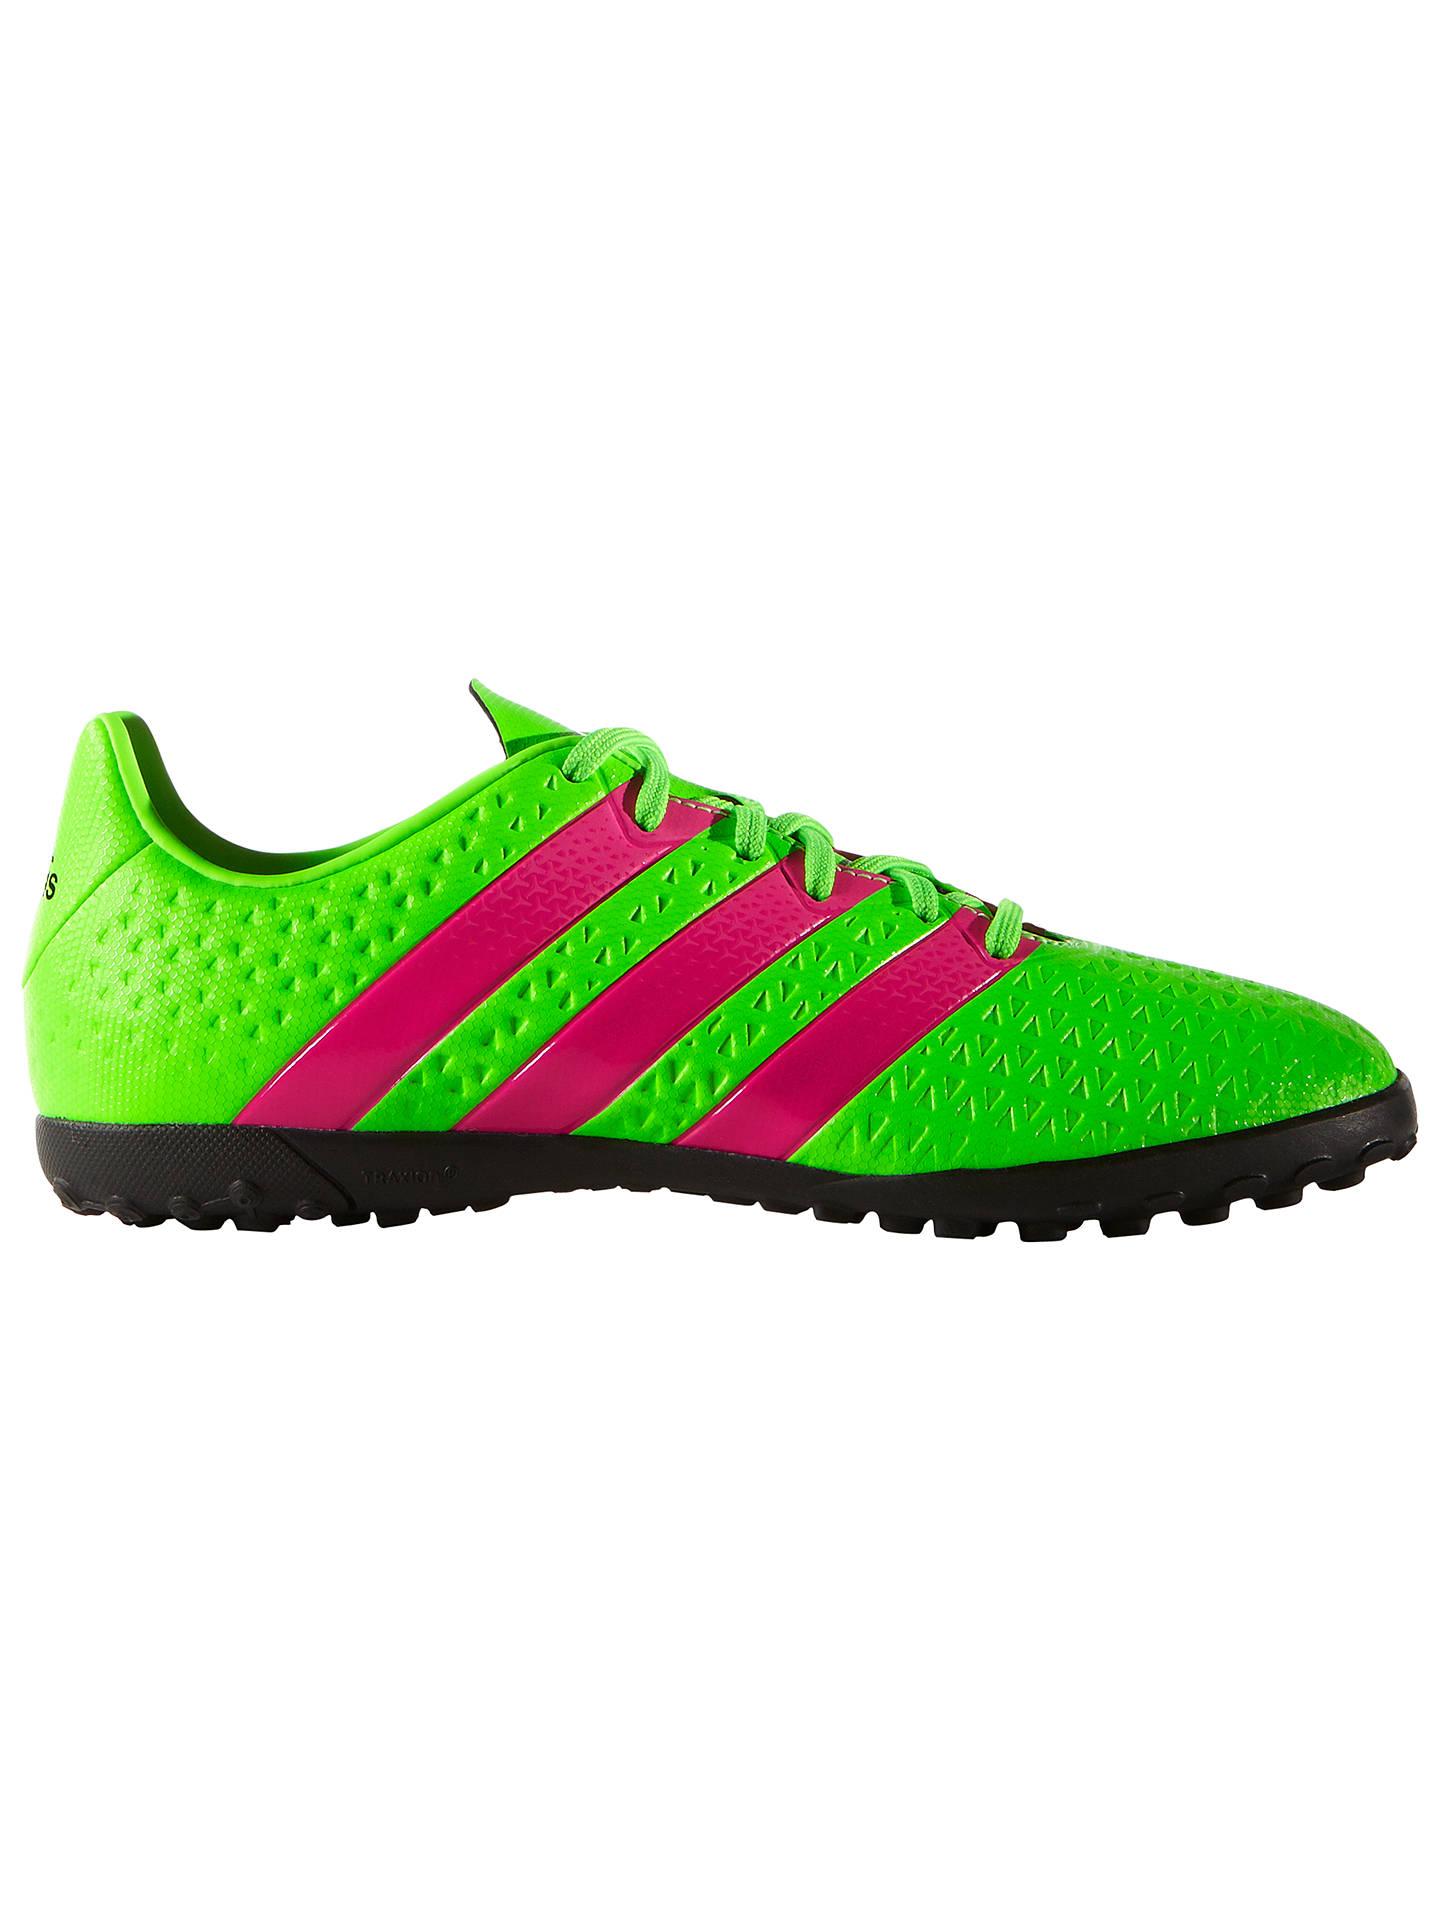 ShoesGreen 16 Astroturf Adidas Lewis 4 John At Children's Ace E29IDHWeY